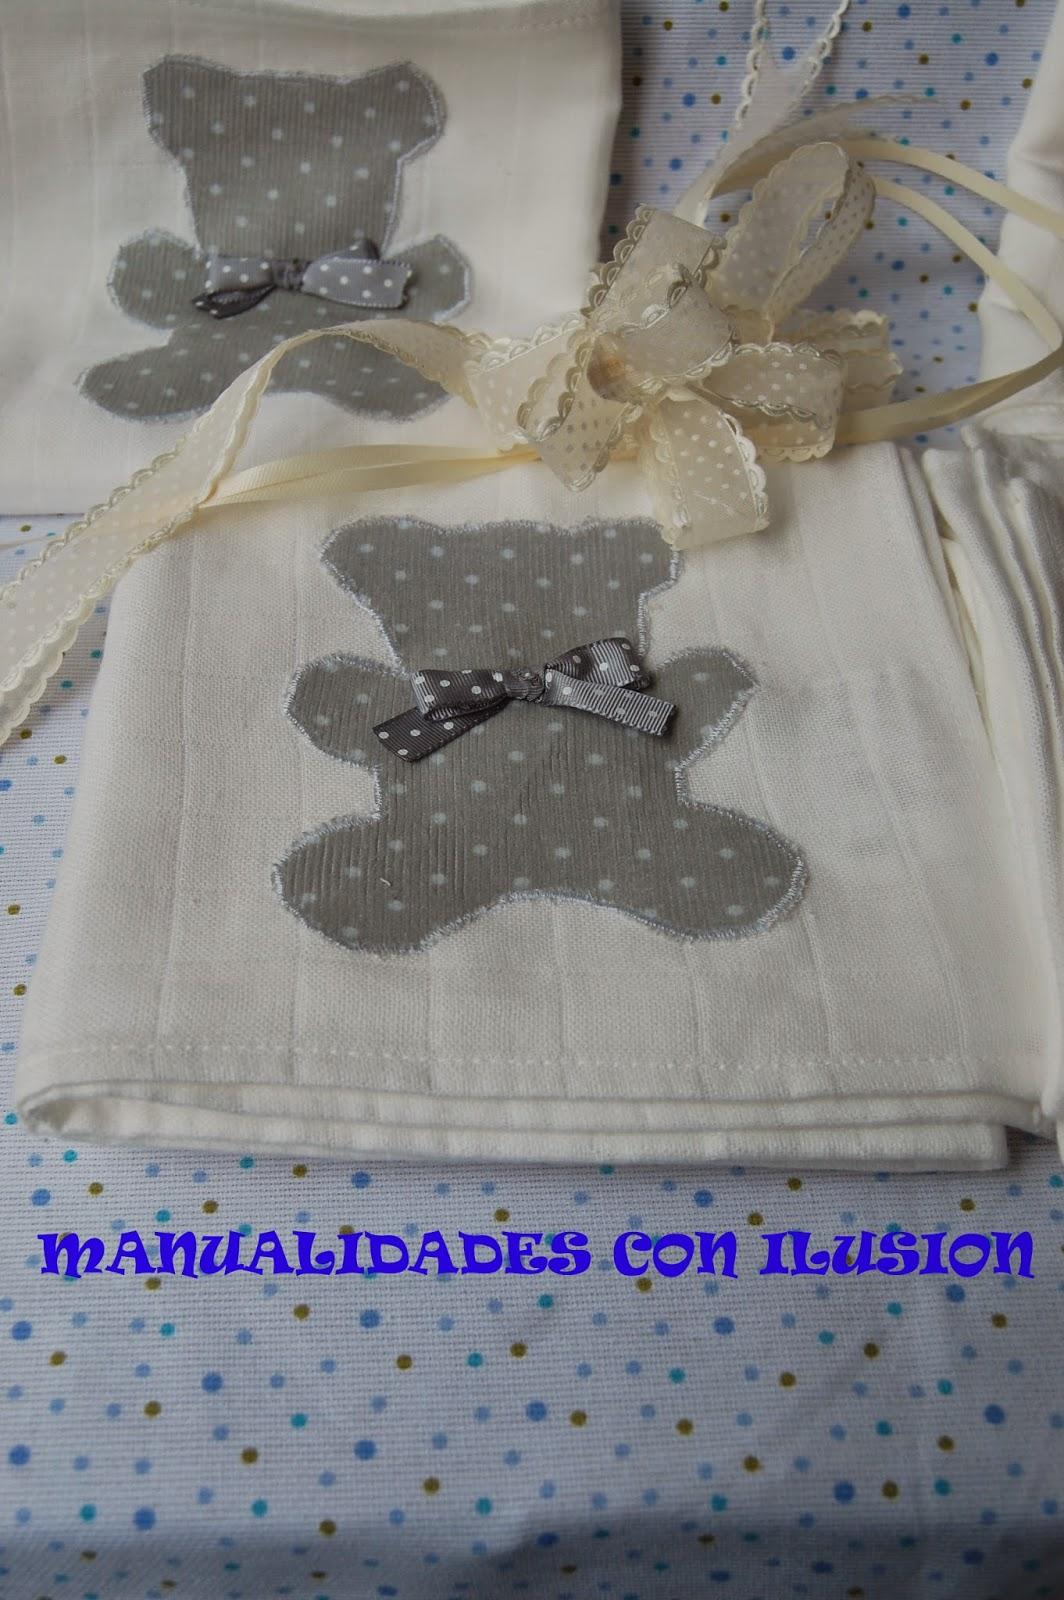 3fc8e97bb beautiful de julio de with de bebe decoradas with paaleros para nio